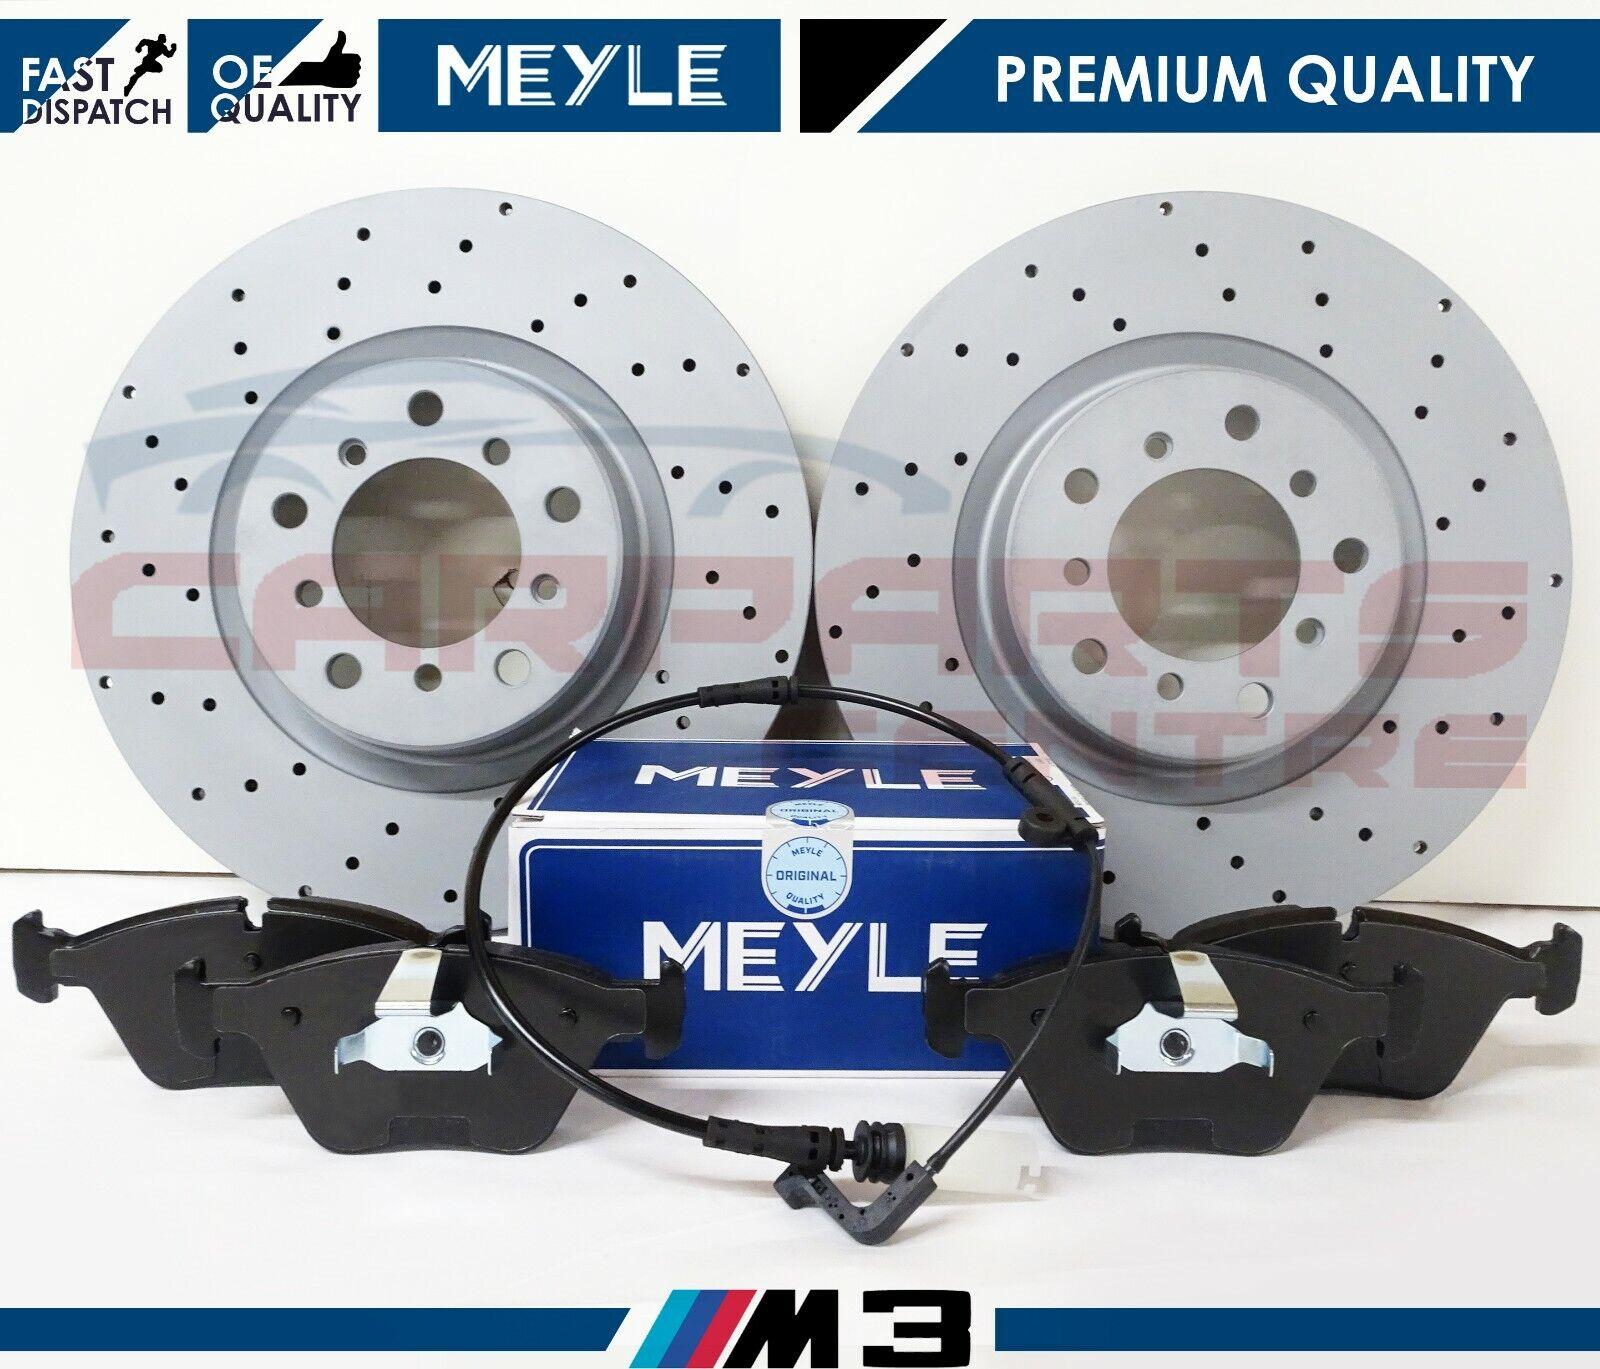 Sensor BMW E46 M3 Front Brembo Brake Pads Meyle Brake Rotors